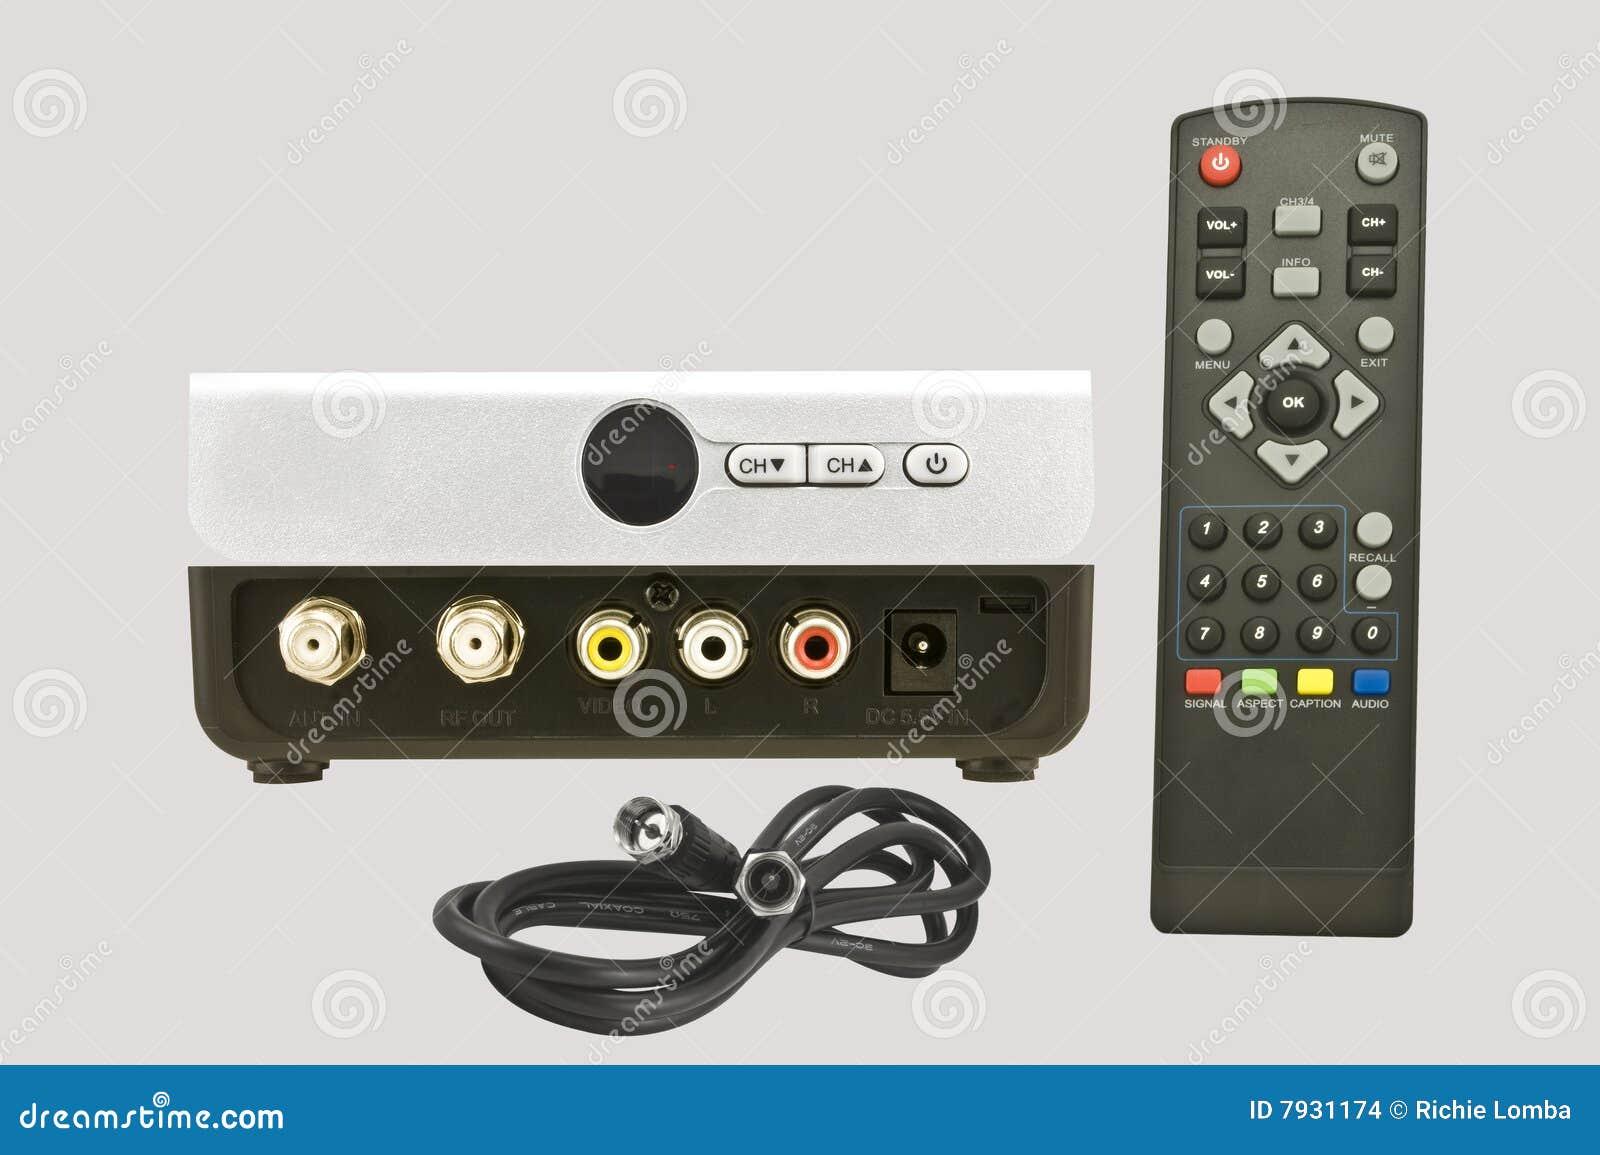 Tv Converter: Tv Converter Or Remote